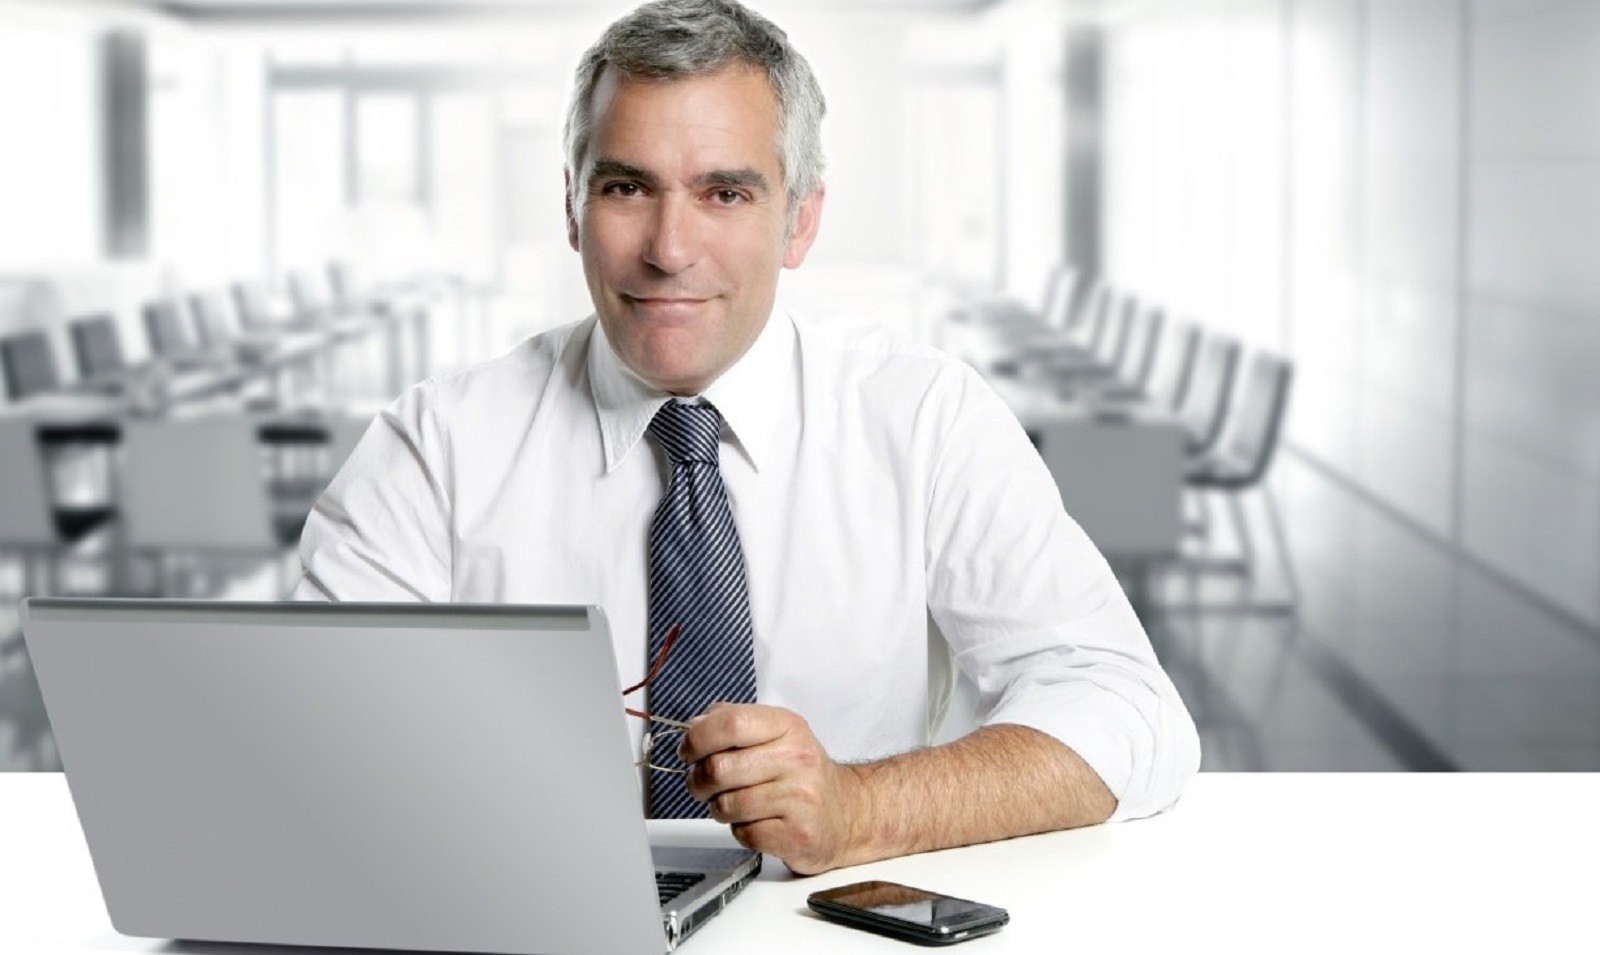 microempreendedor-individual-homem-co-computador